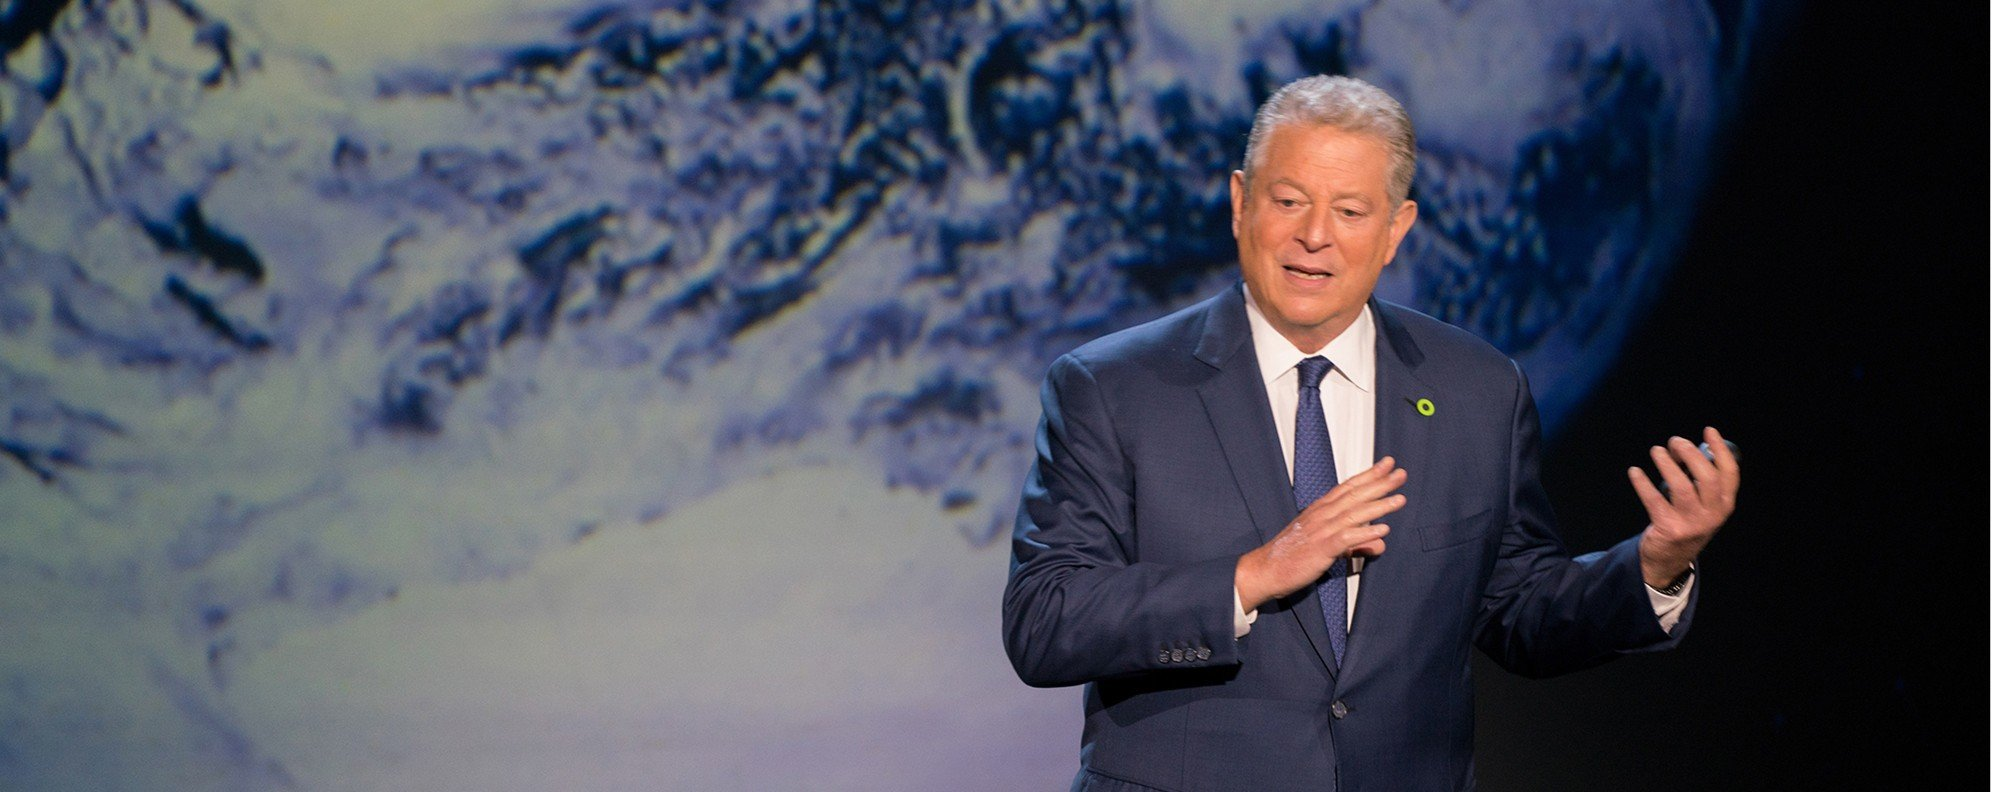 Al Gore presents An Inconvenient Sequel in Houston, Texas.